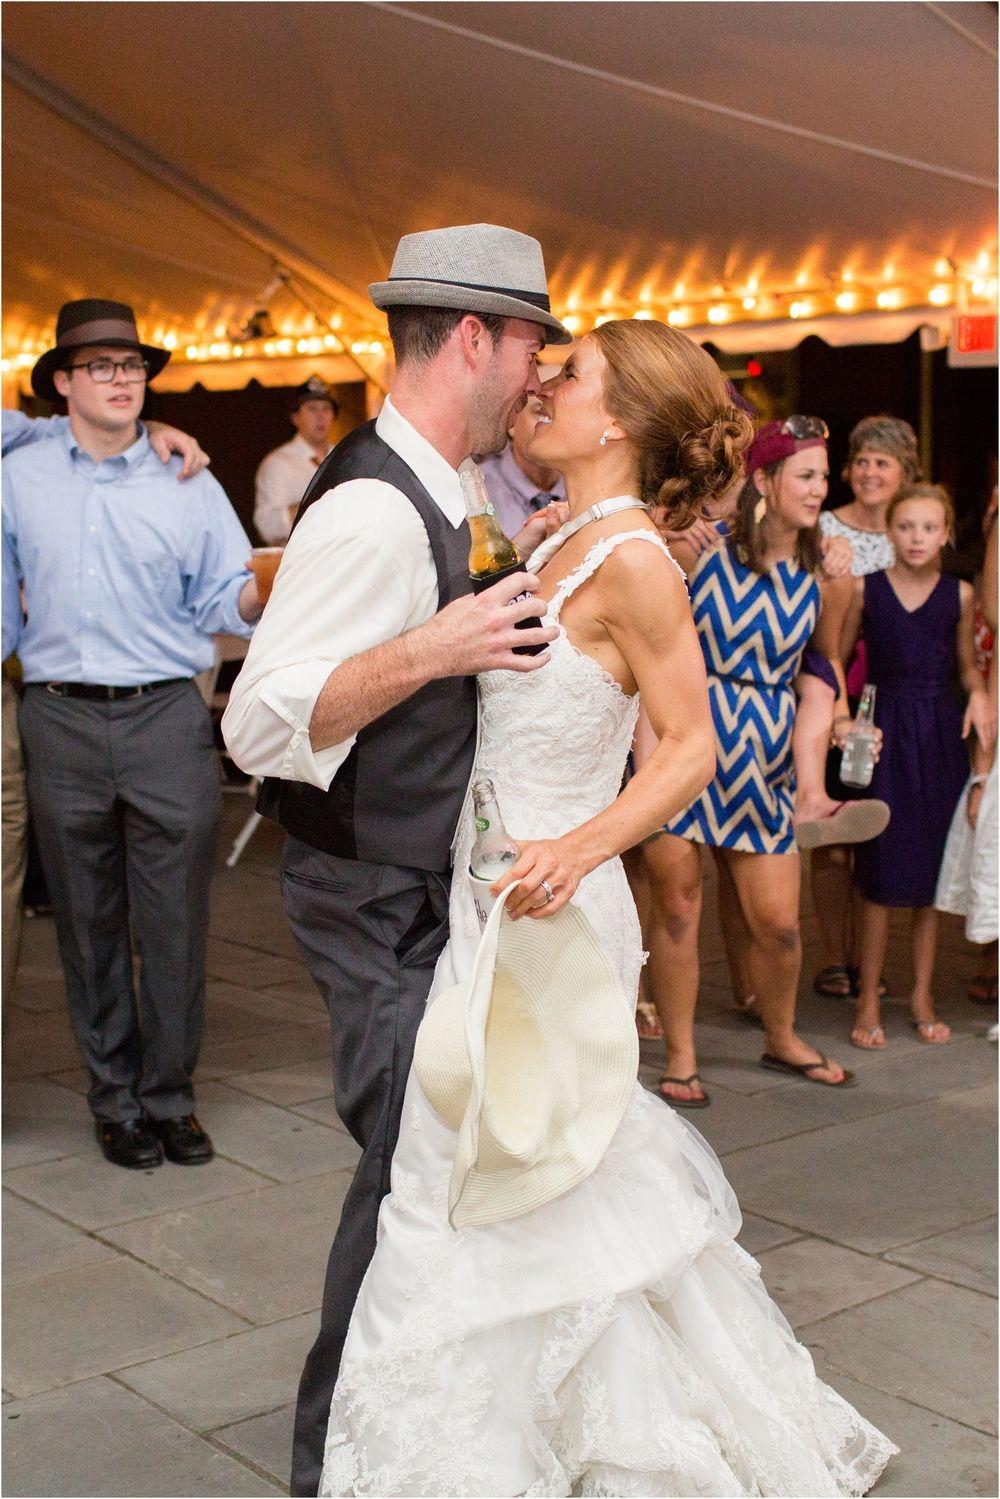 Wedding dresses richmond va  BRITTANY u KYLE Historic Tredegar in Richmond VA  Brittany and